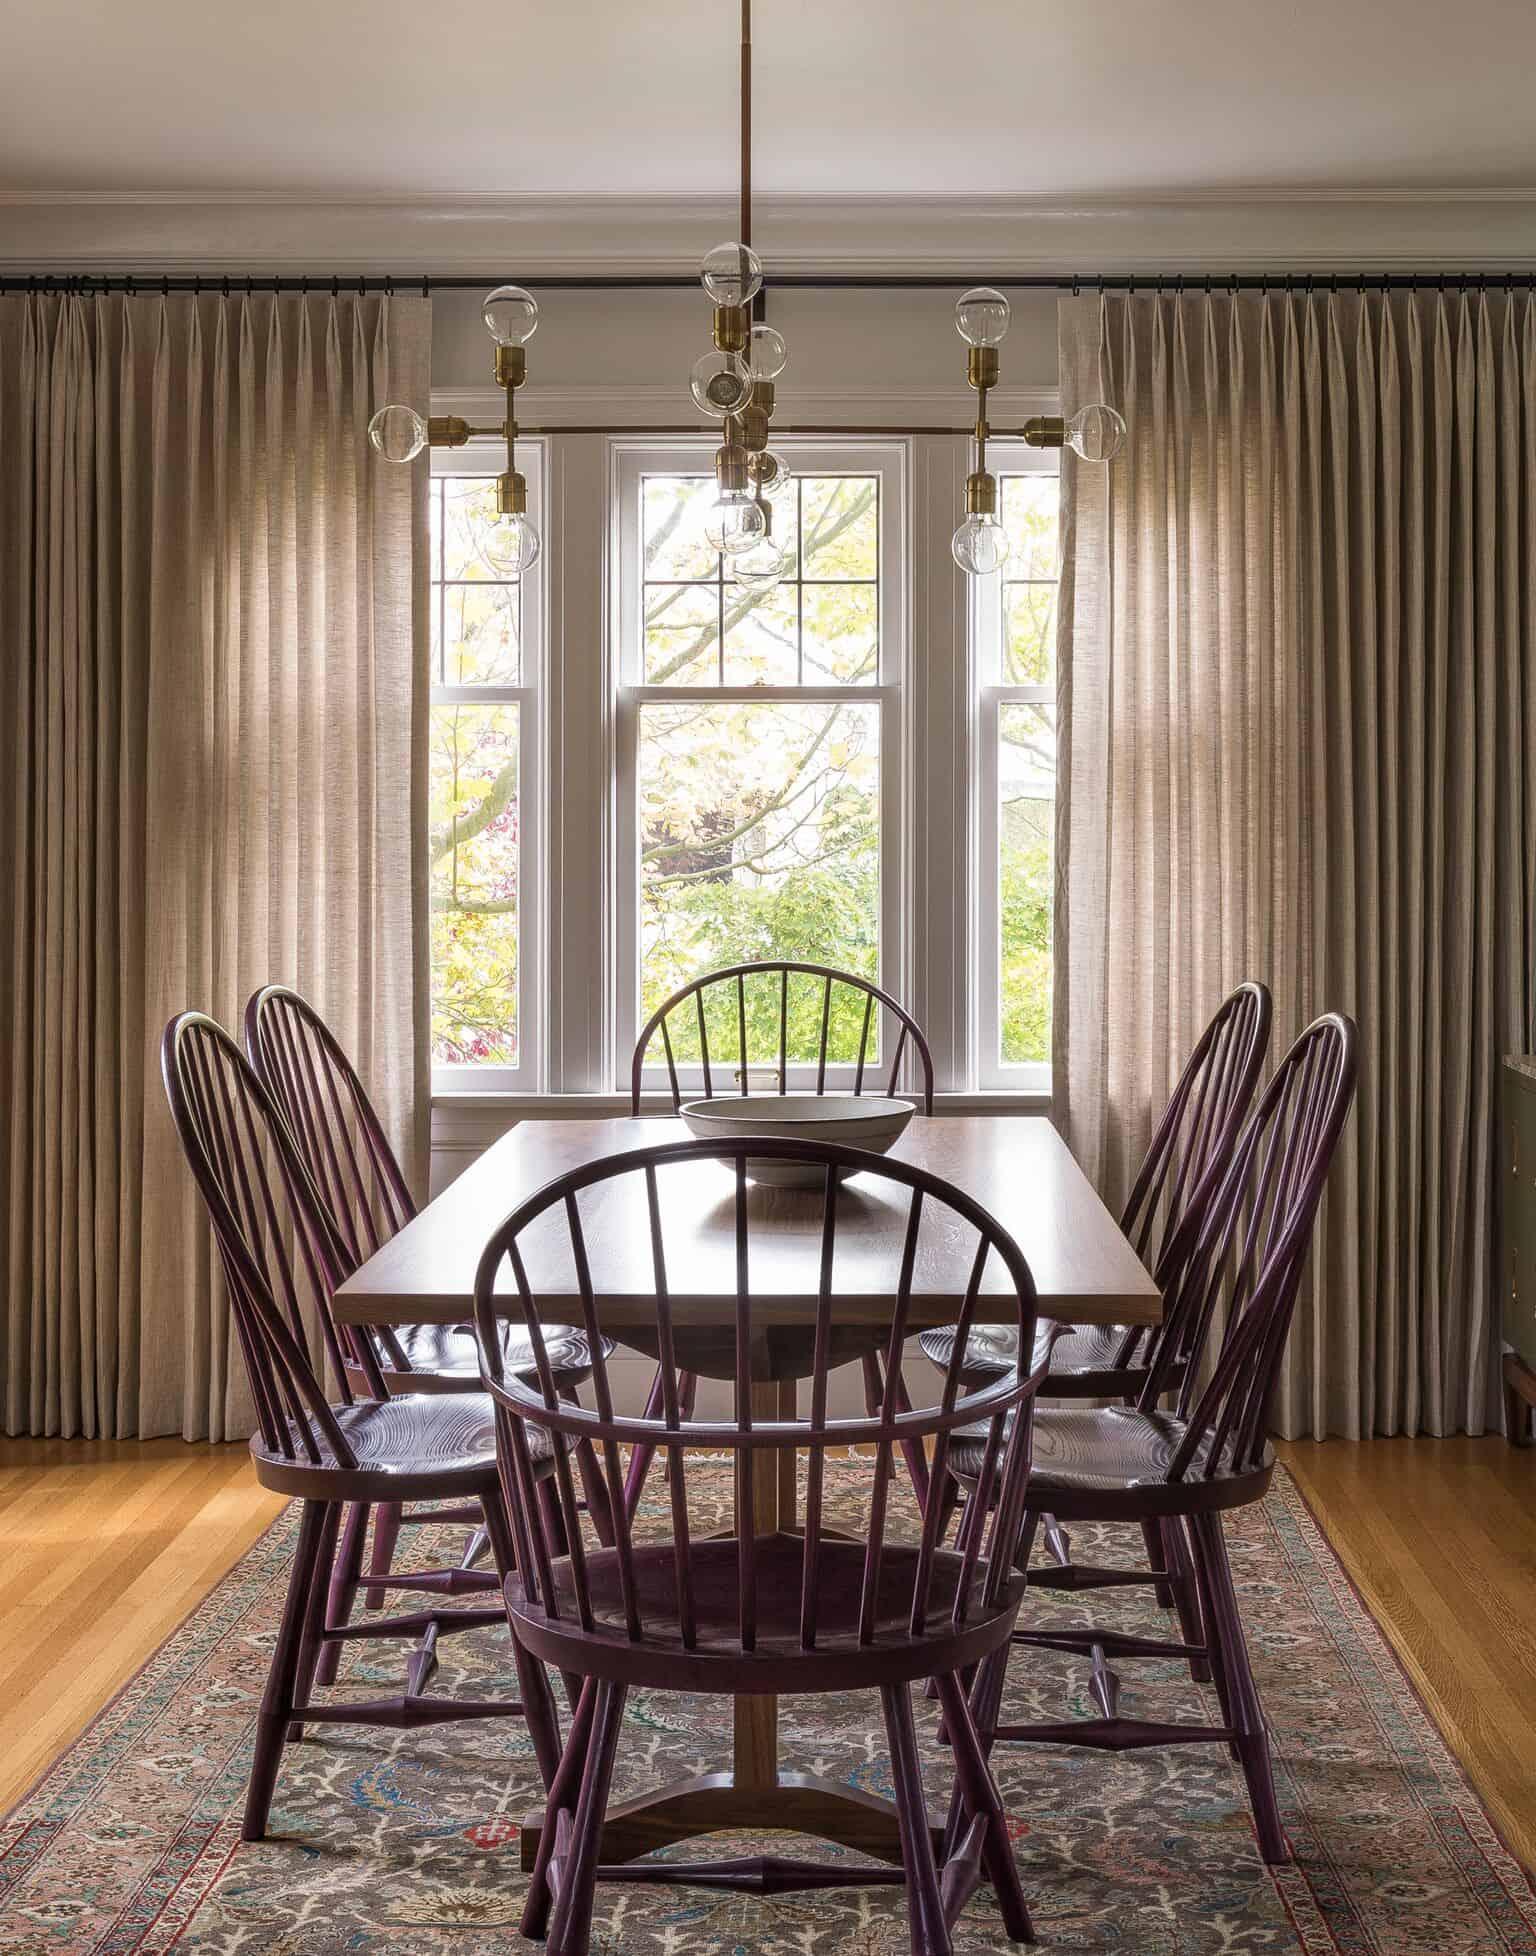 Fine Heidi Caillier Design Seattle Interior Designer Pnw Tudor Download Free Architecture Designs Viewormadebymaigaardcom